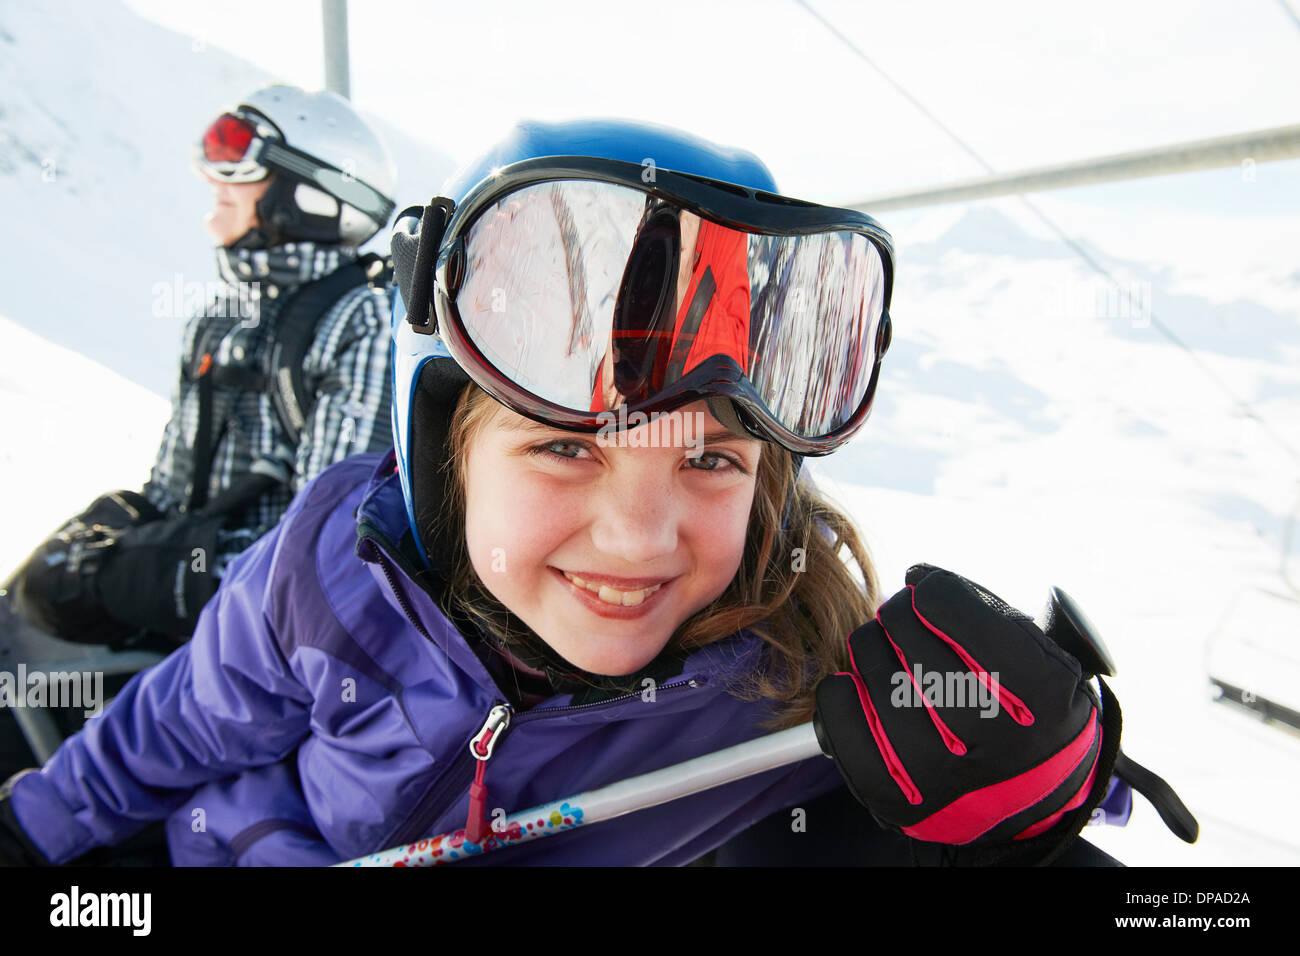 Retrato de niña en ski lift, Les Arcs, Haute-Savoie, Francia Imagen De Stock